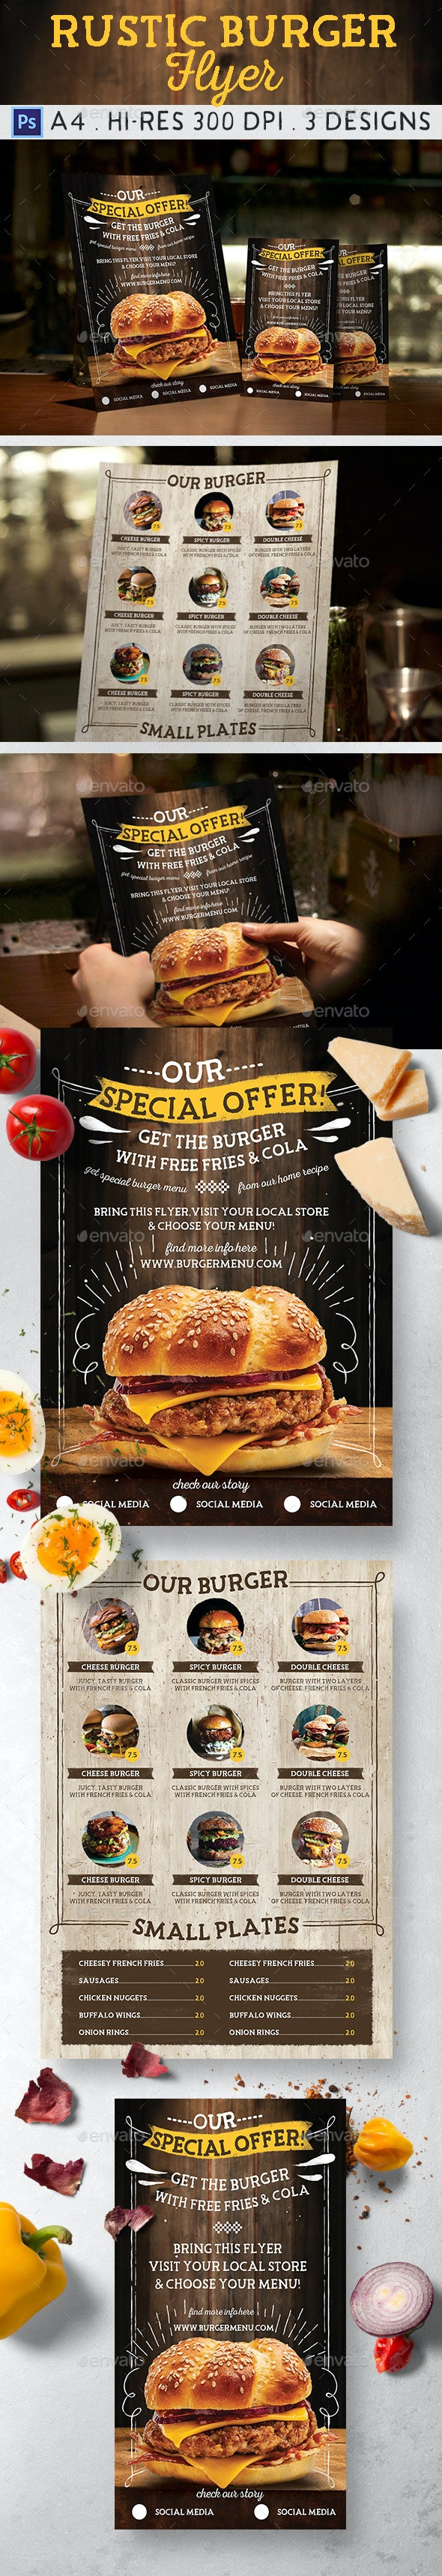 Rustic Burger Flyer - Food Menus Print Templates